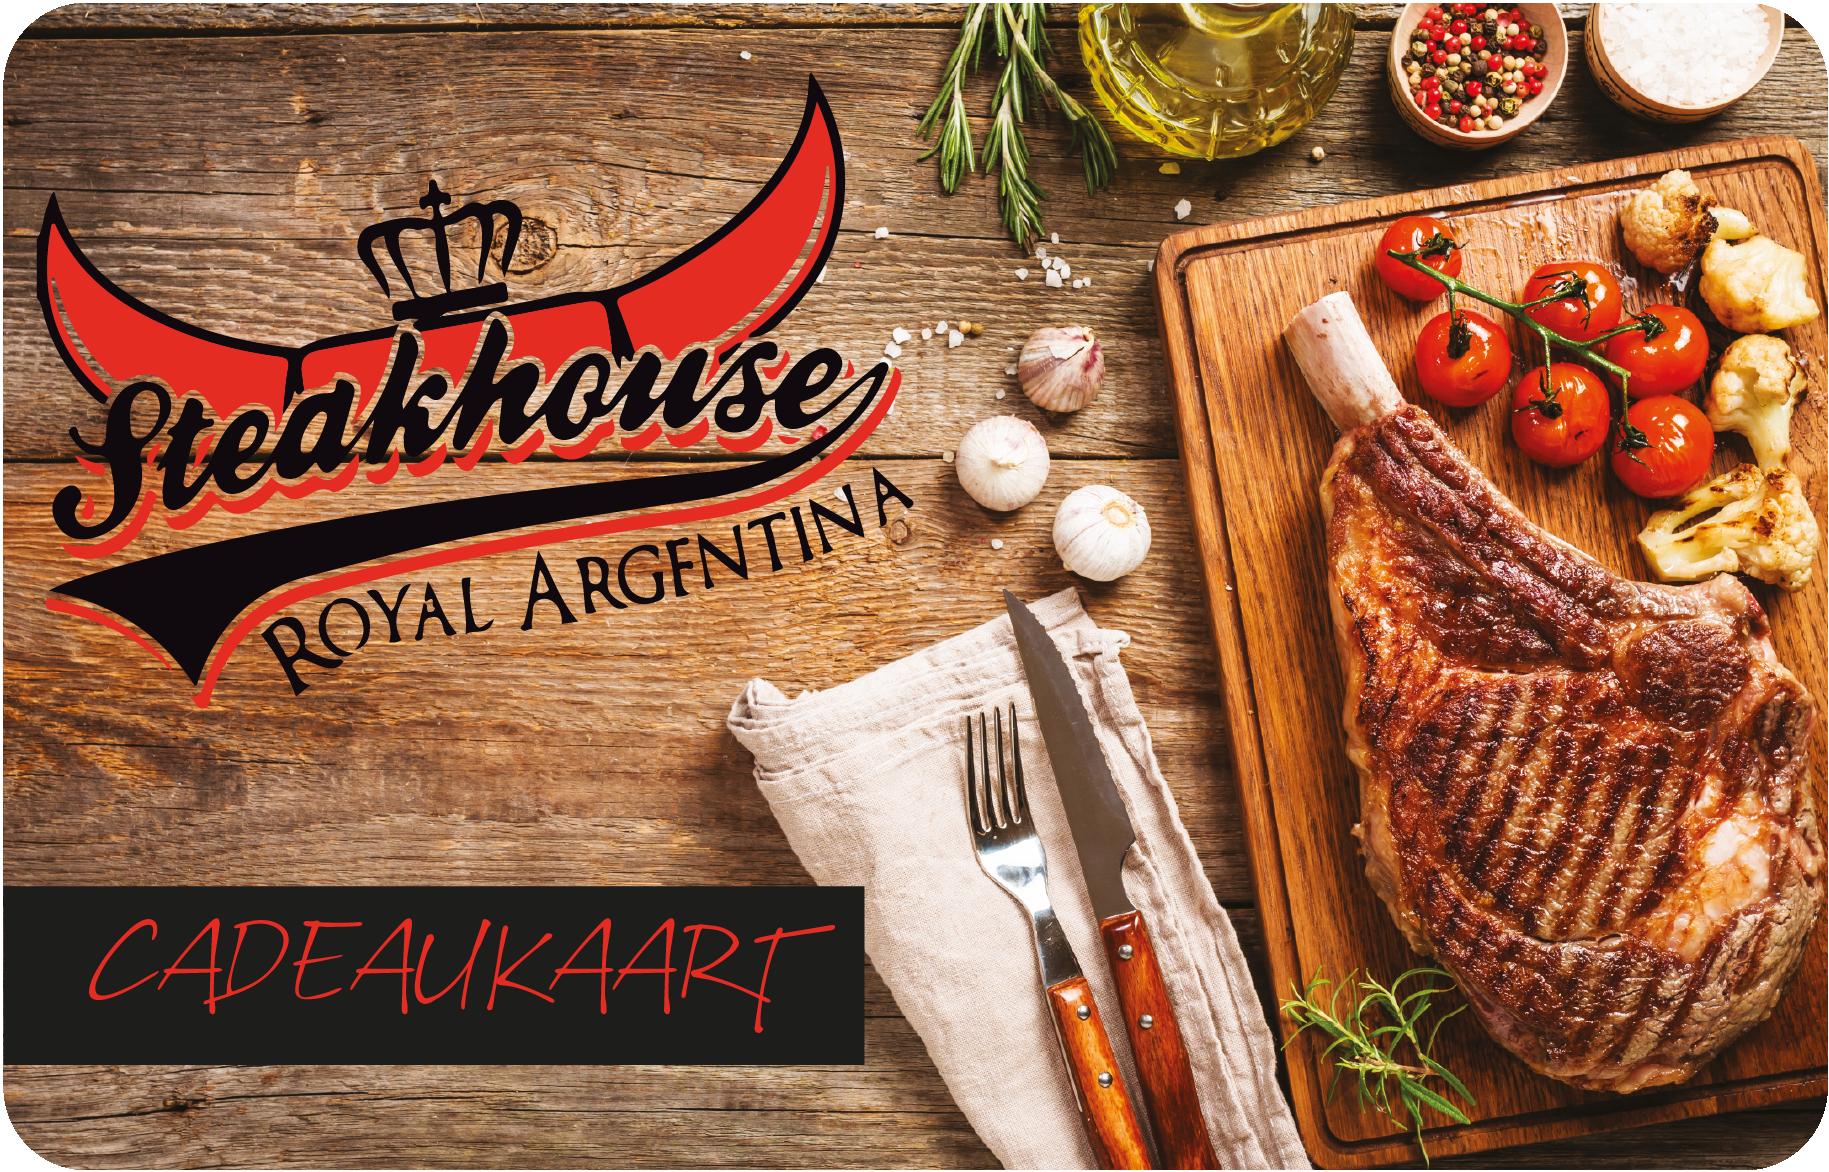 Steakhouse Royal Argentina-1